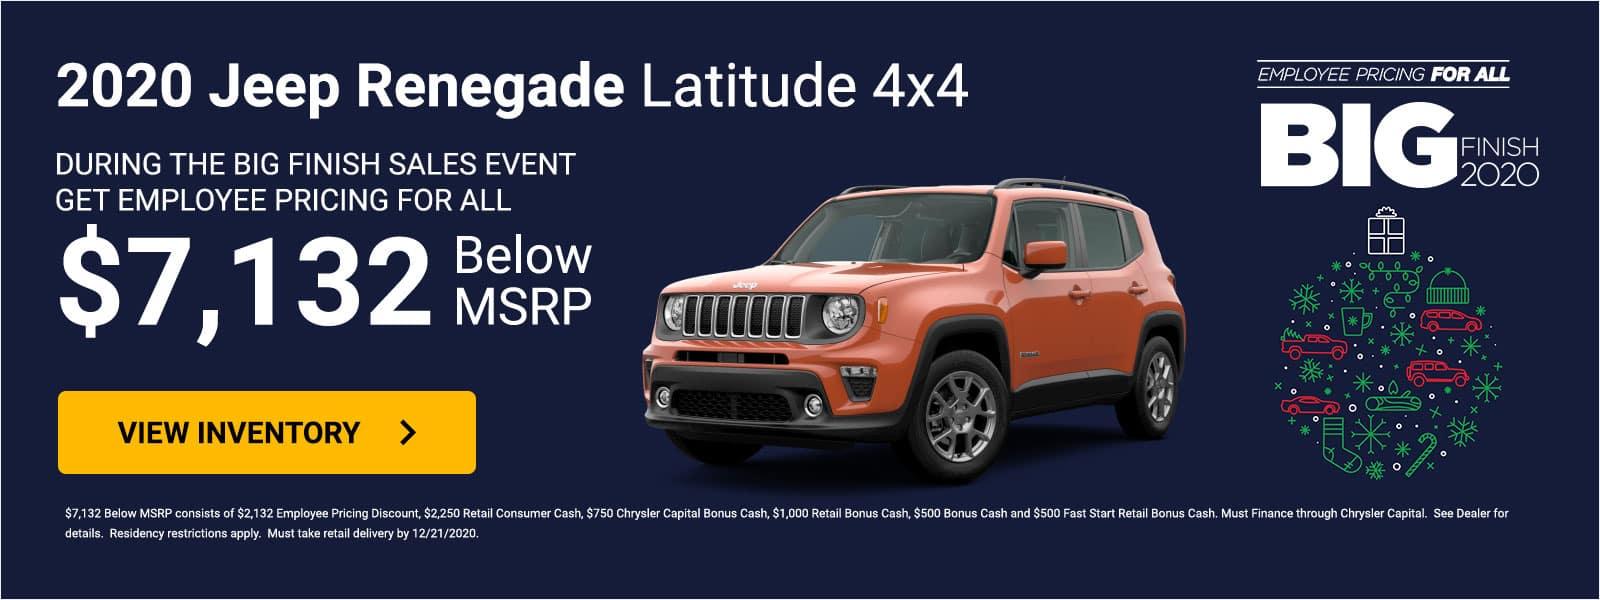 MABC_Banners_1600x600_2020-12_509913_20-Jeep-Renegade-3